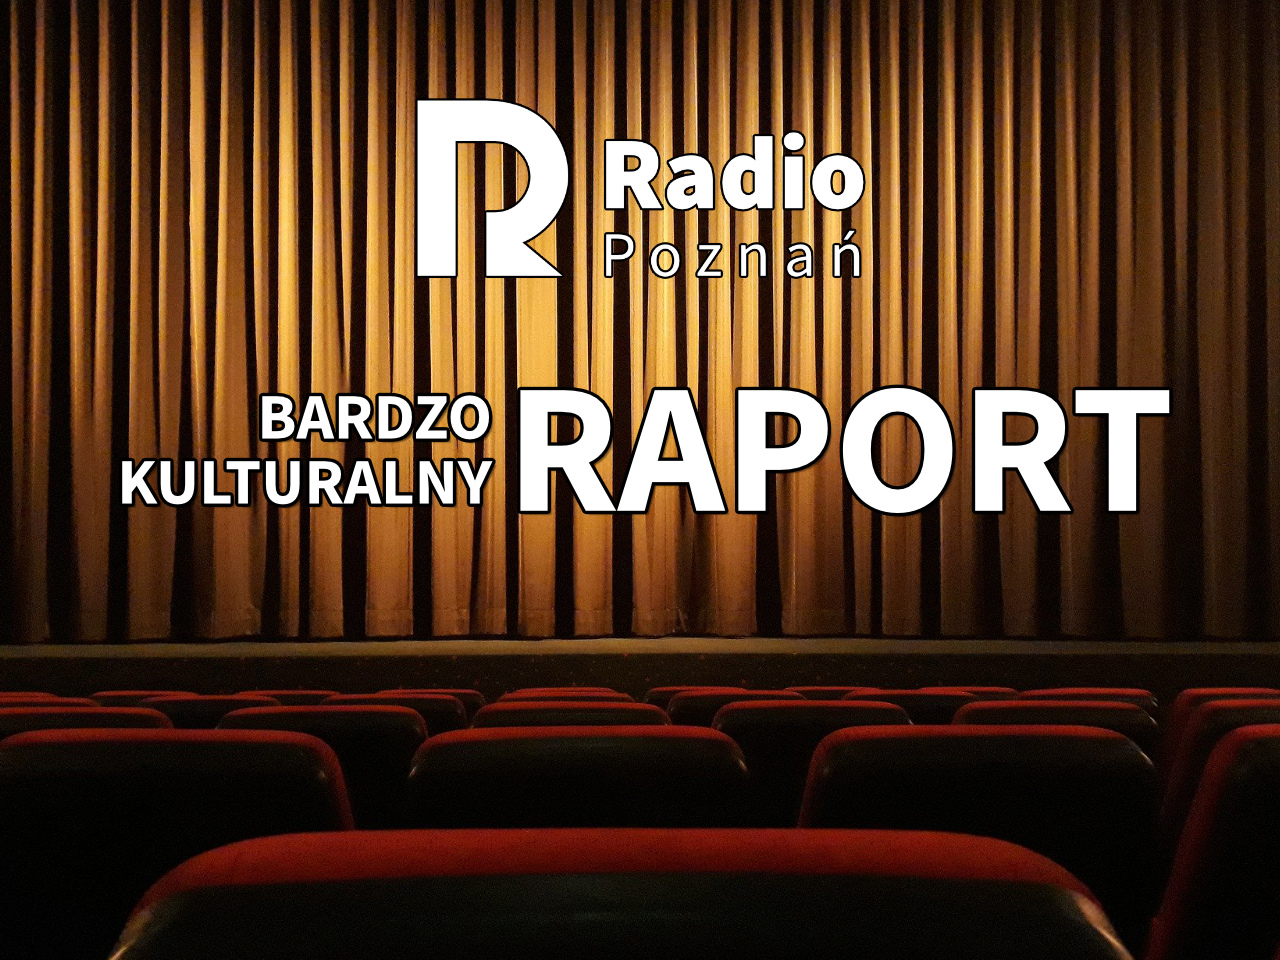 kultura serwis cibor bardzo kulturalny raport - Radio Poznań